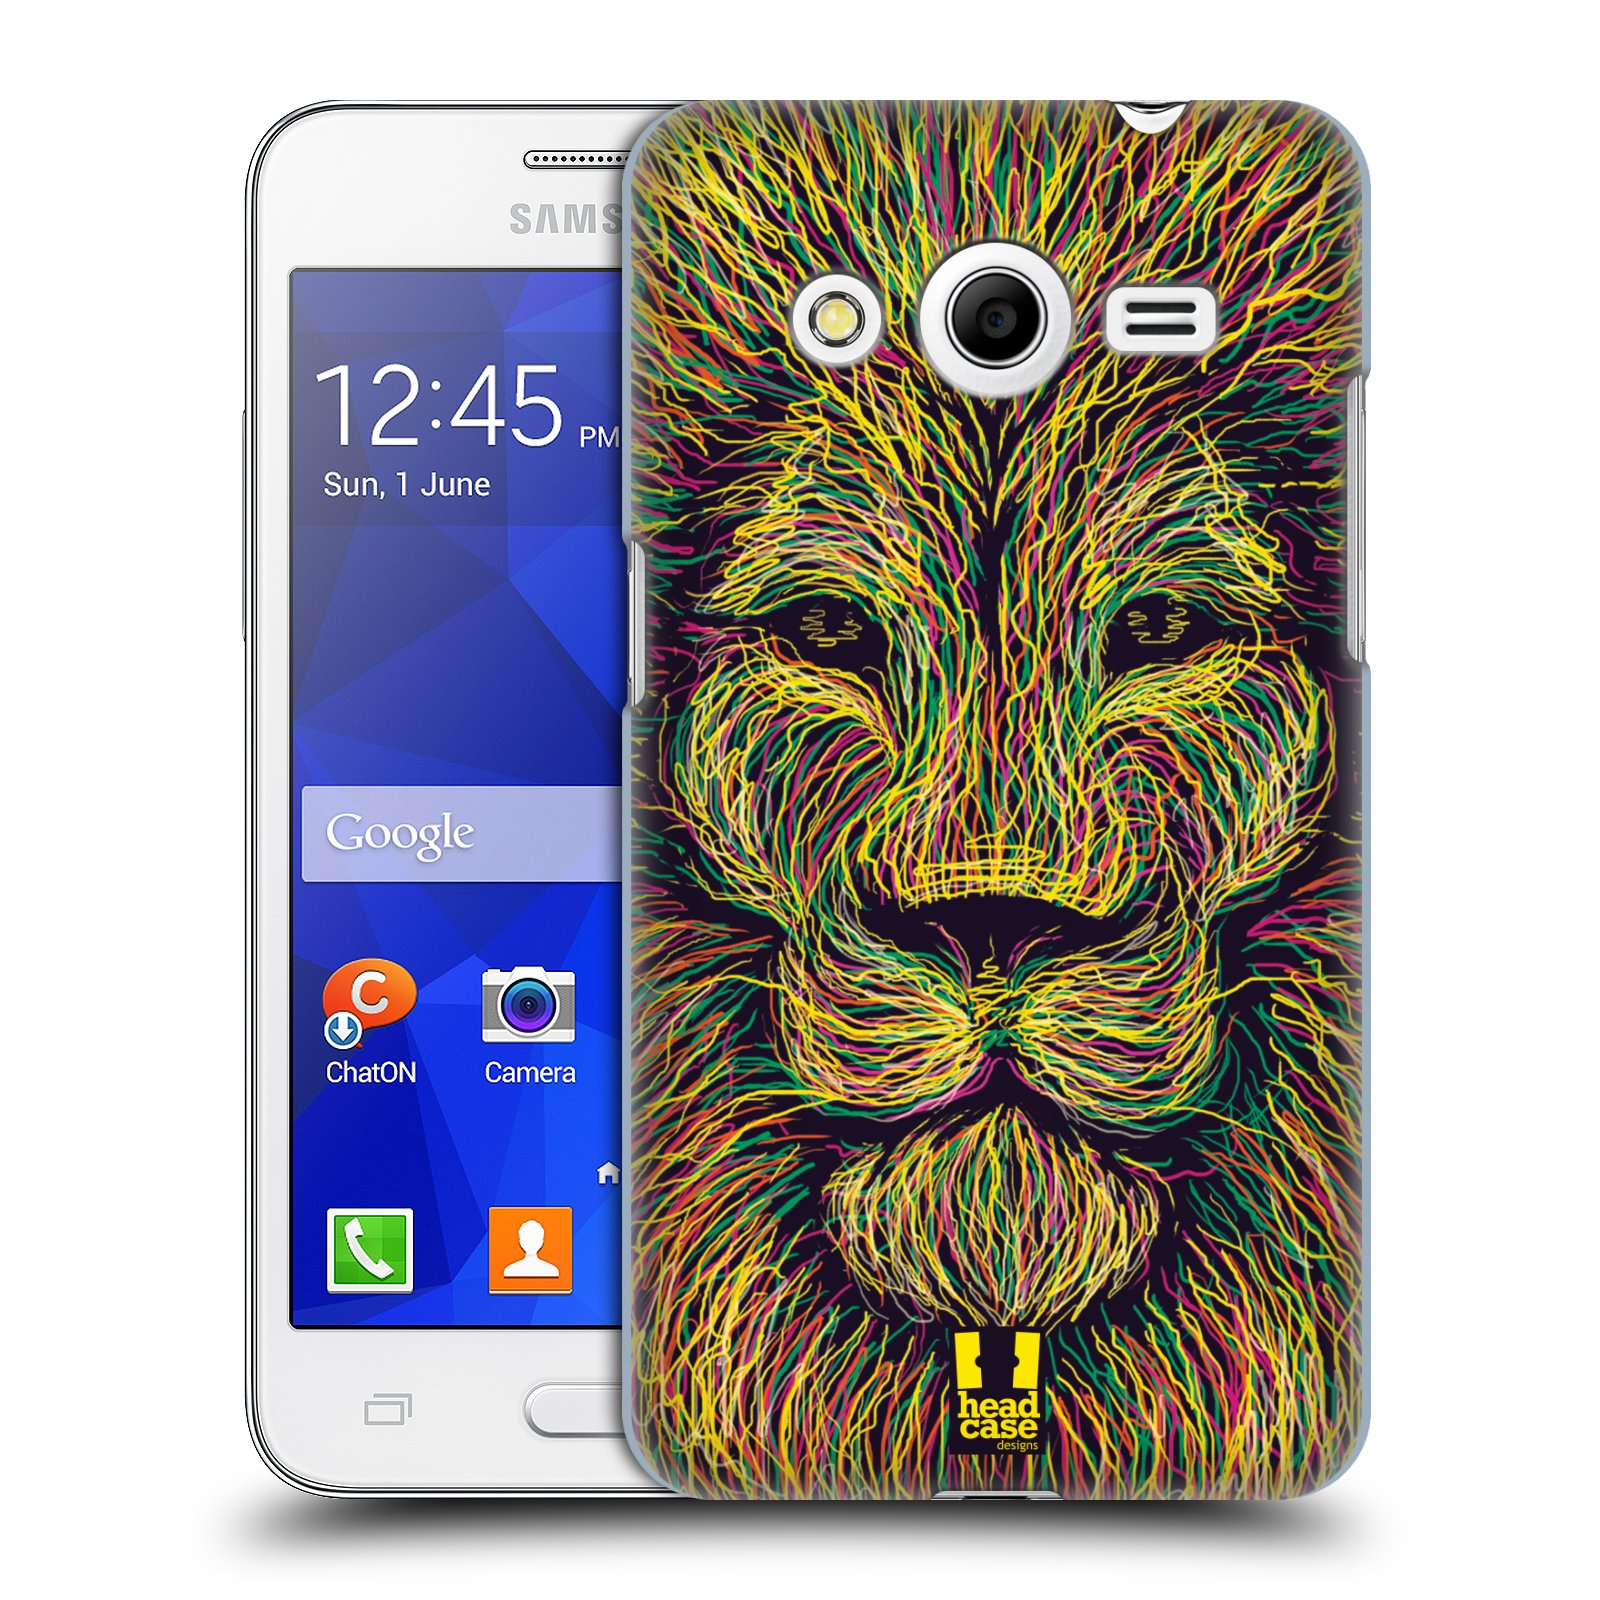 HEAD CASE plastový obal na mobil SAMSUNG GALAXY Core 2 (G355H) vzor zvíře čmáranice lev